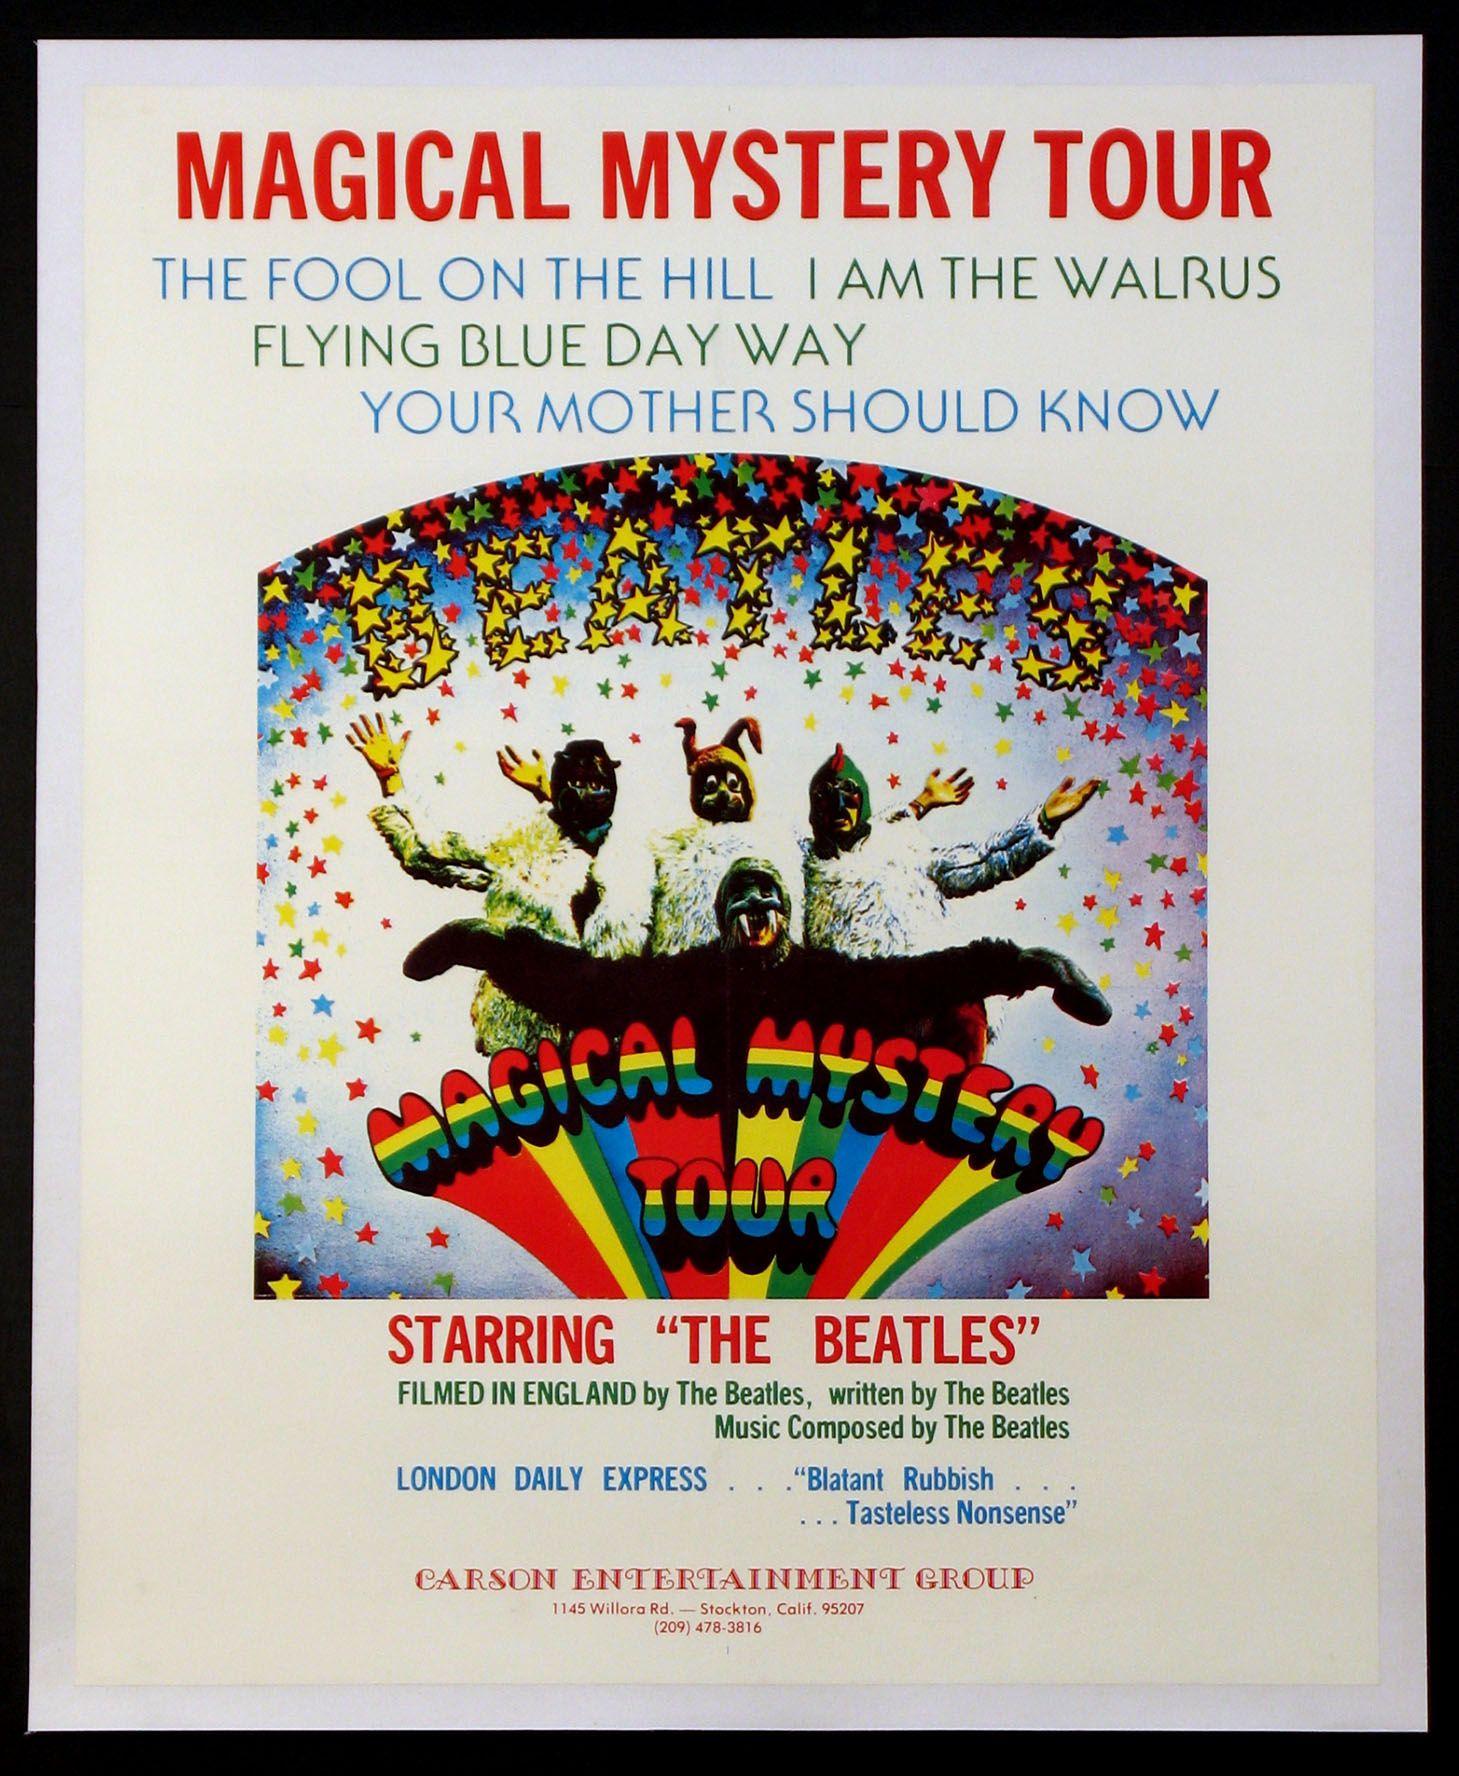 Magical Mystery Tour 1967 Original 23x29 Size Movie Poster Magical Mystery Tour Movie The Beatles Beatles Magical Mystery Tour